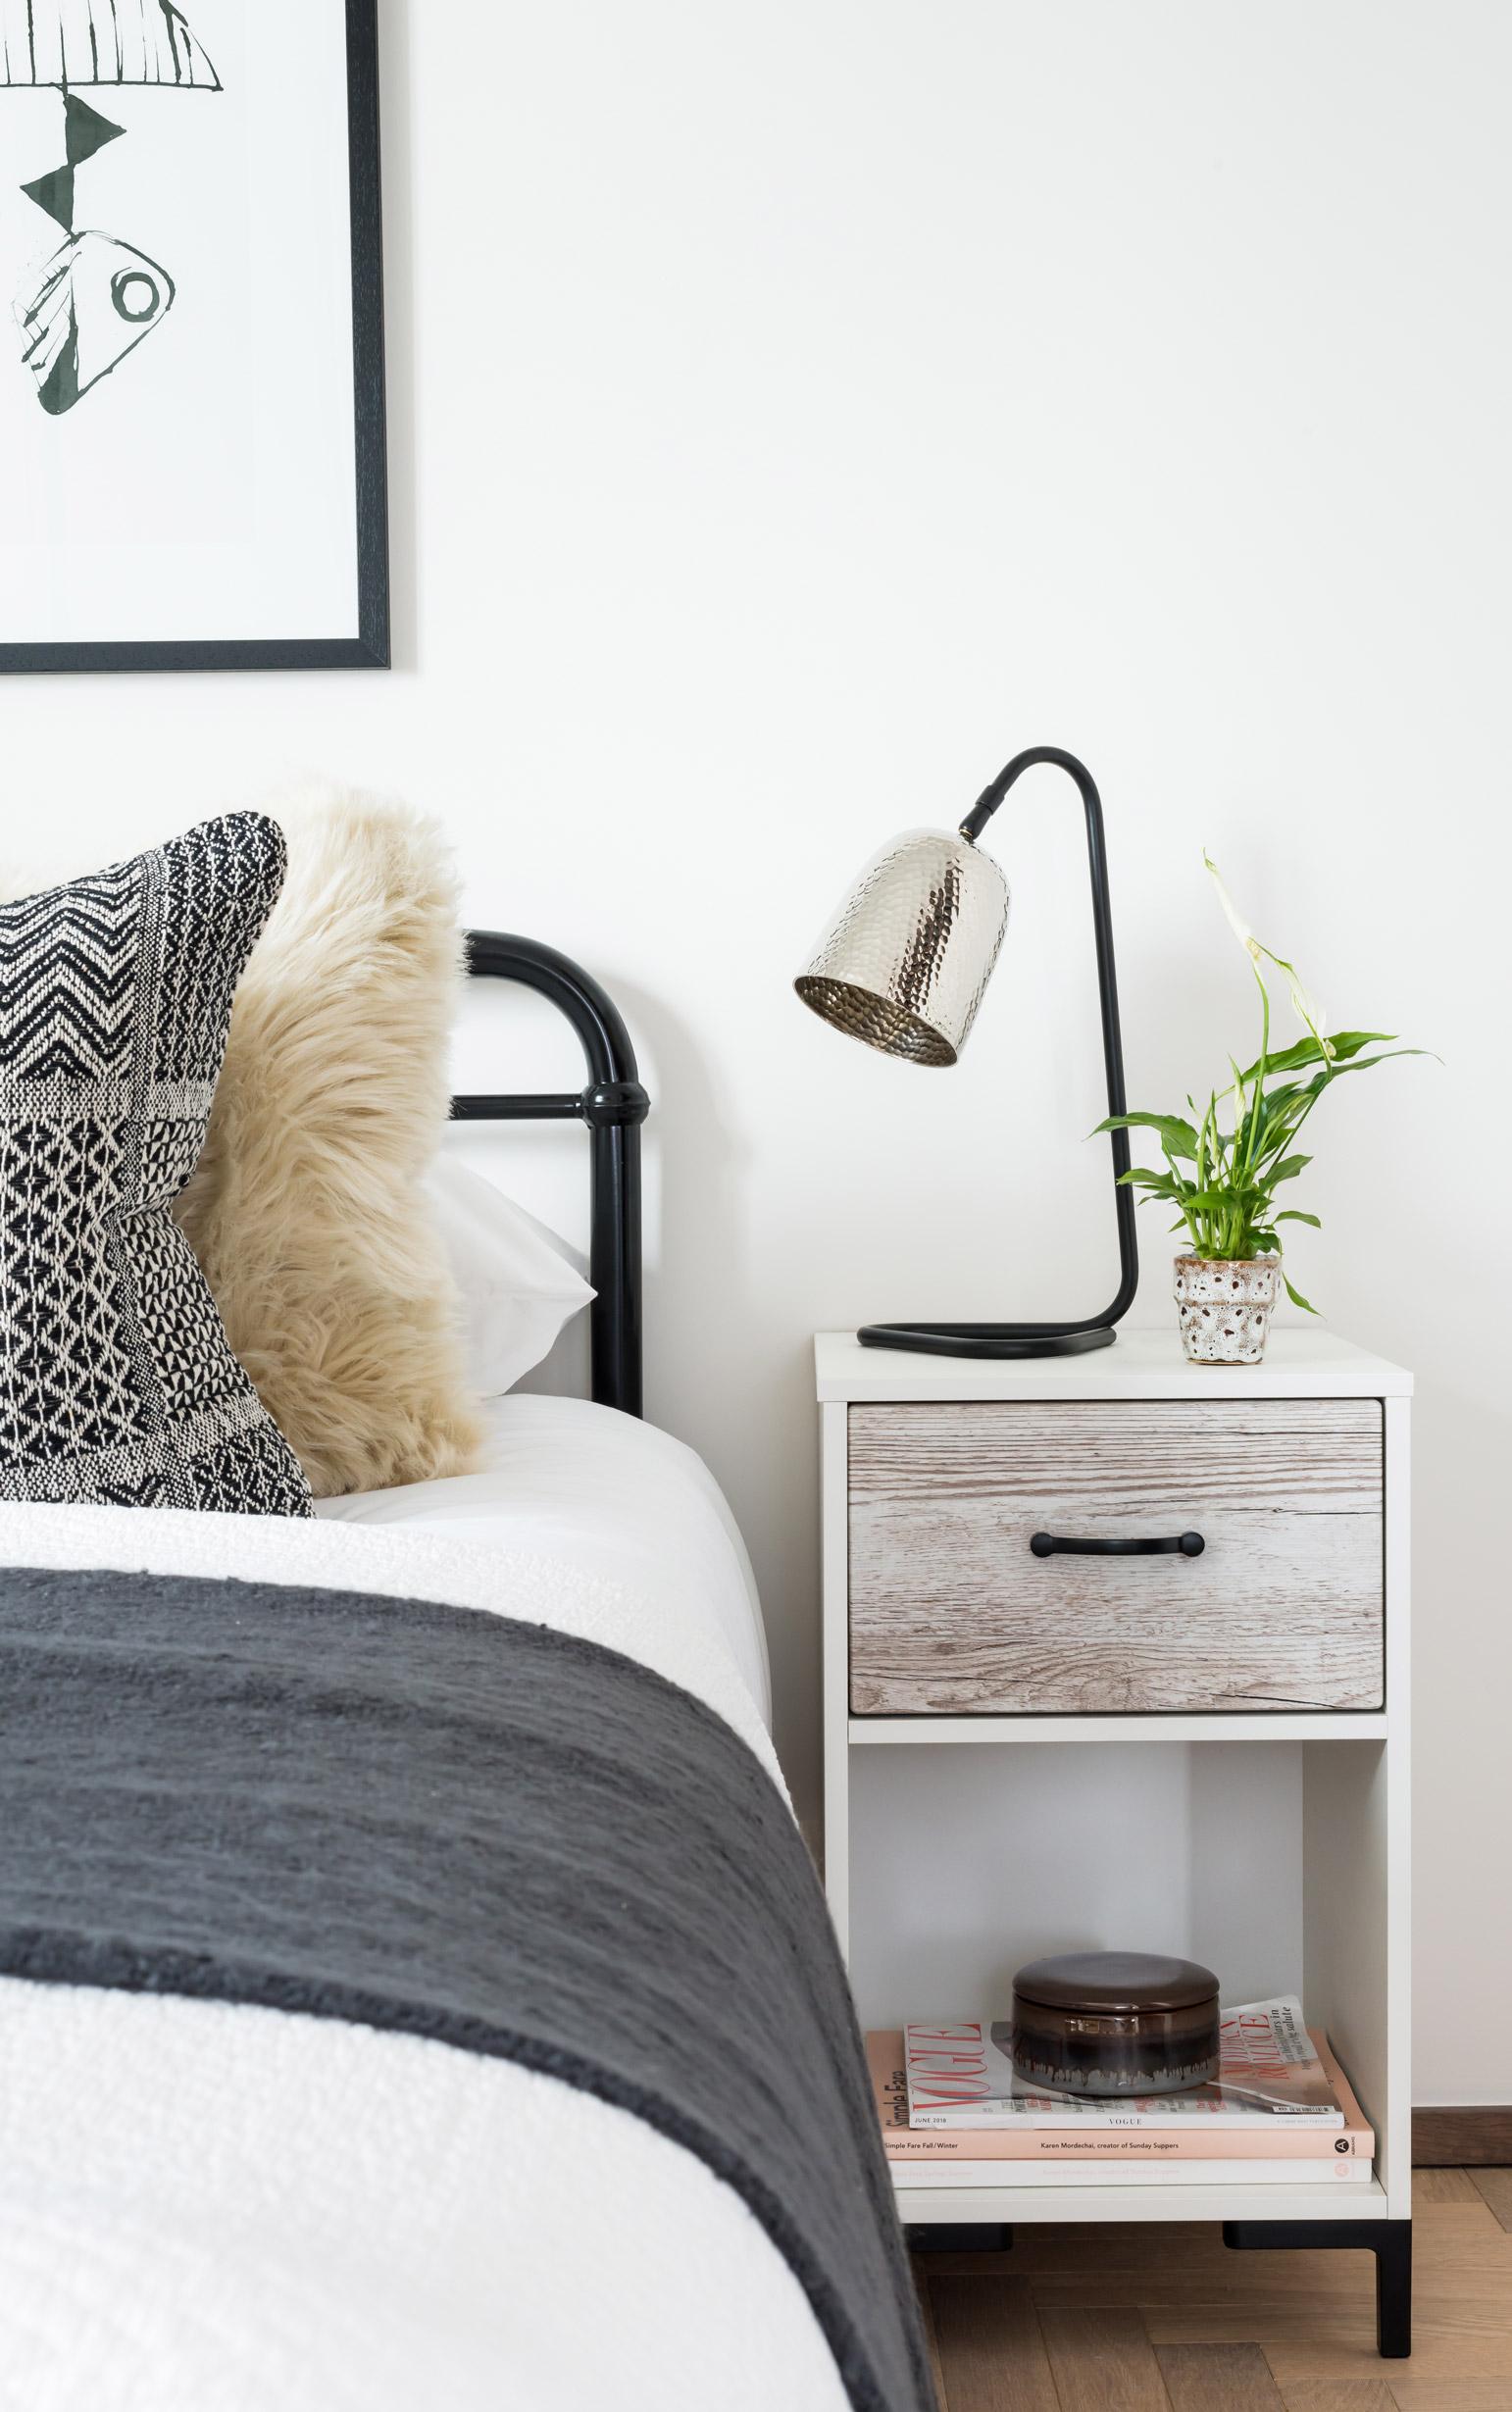 Riley_20_Bedroom.jpg